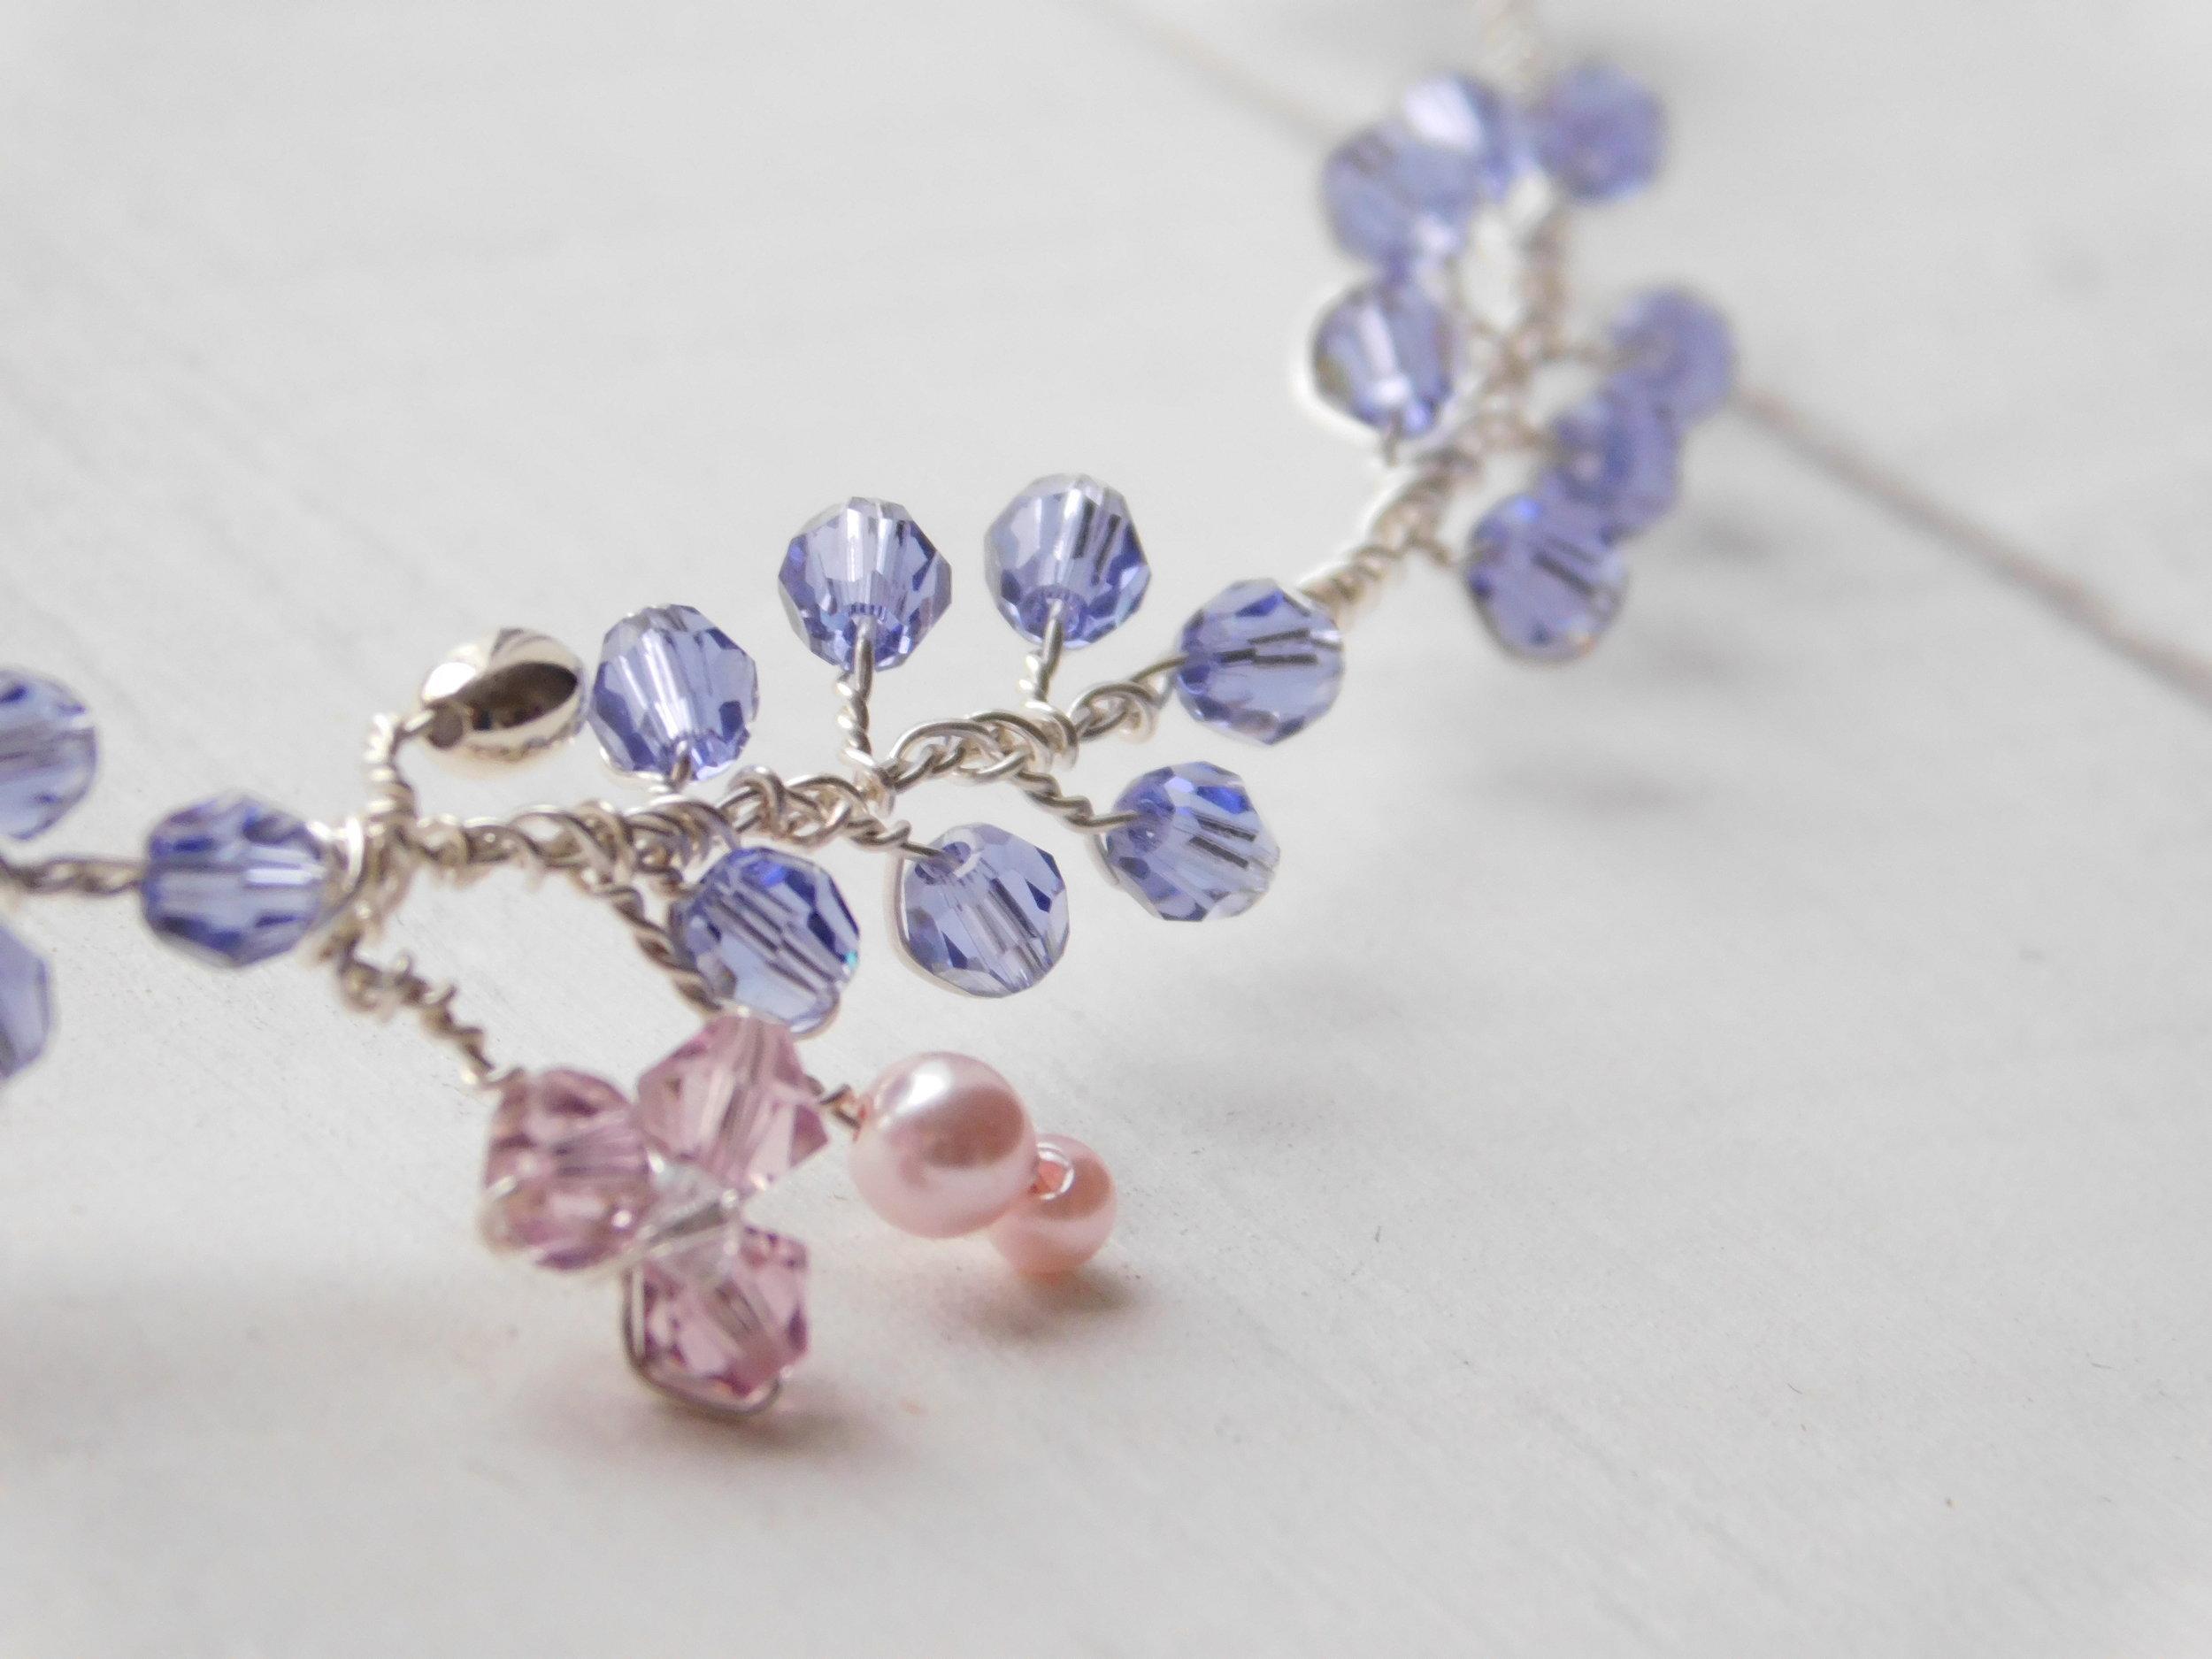 Lavender crystal necklace